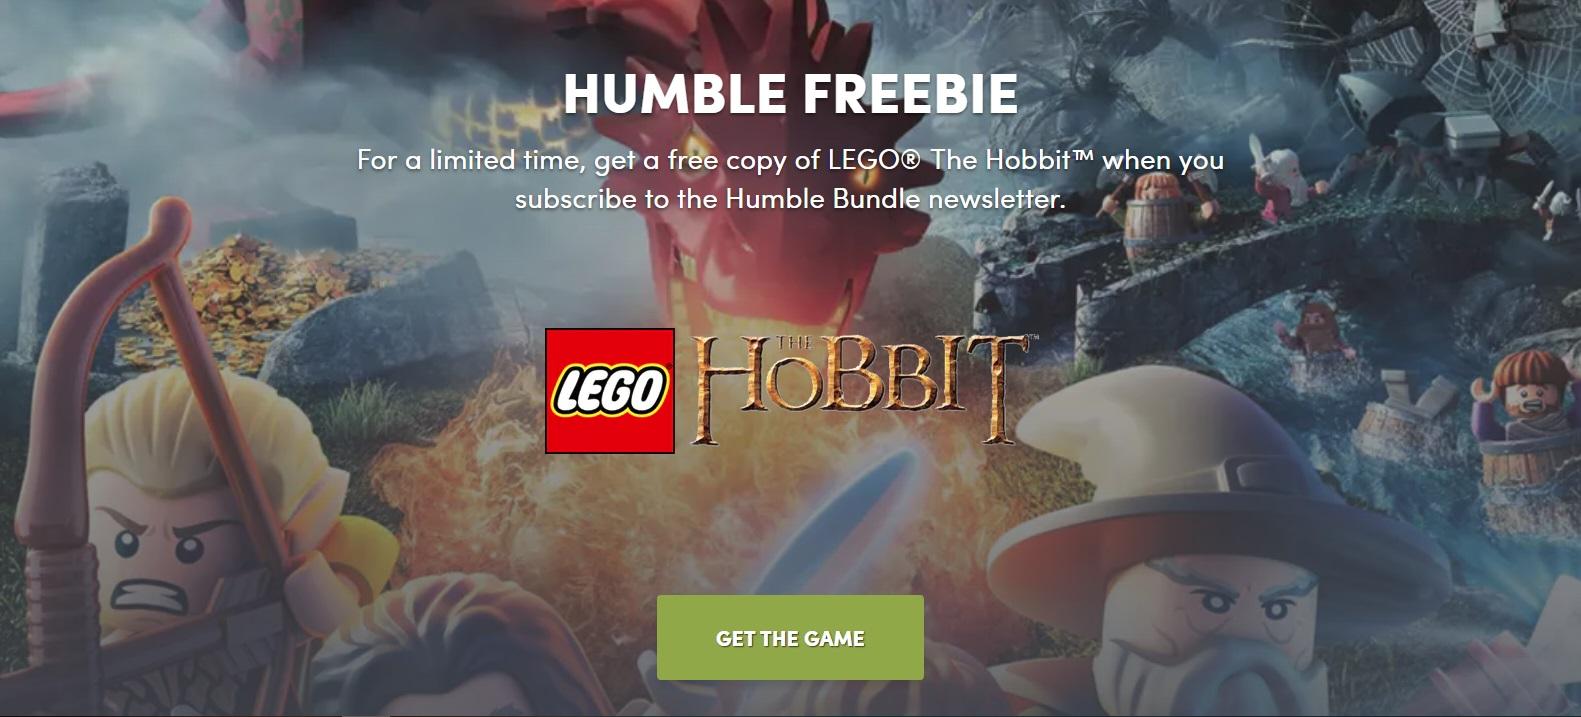 lego hobbit hamble